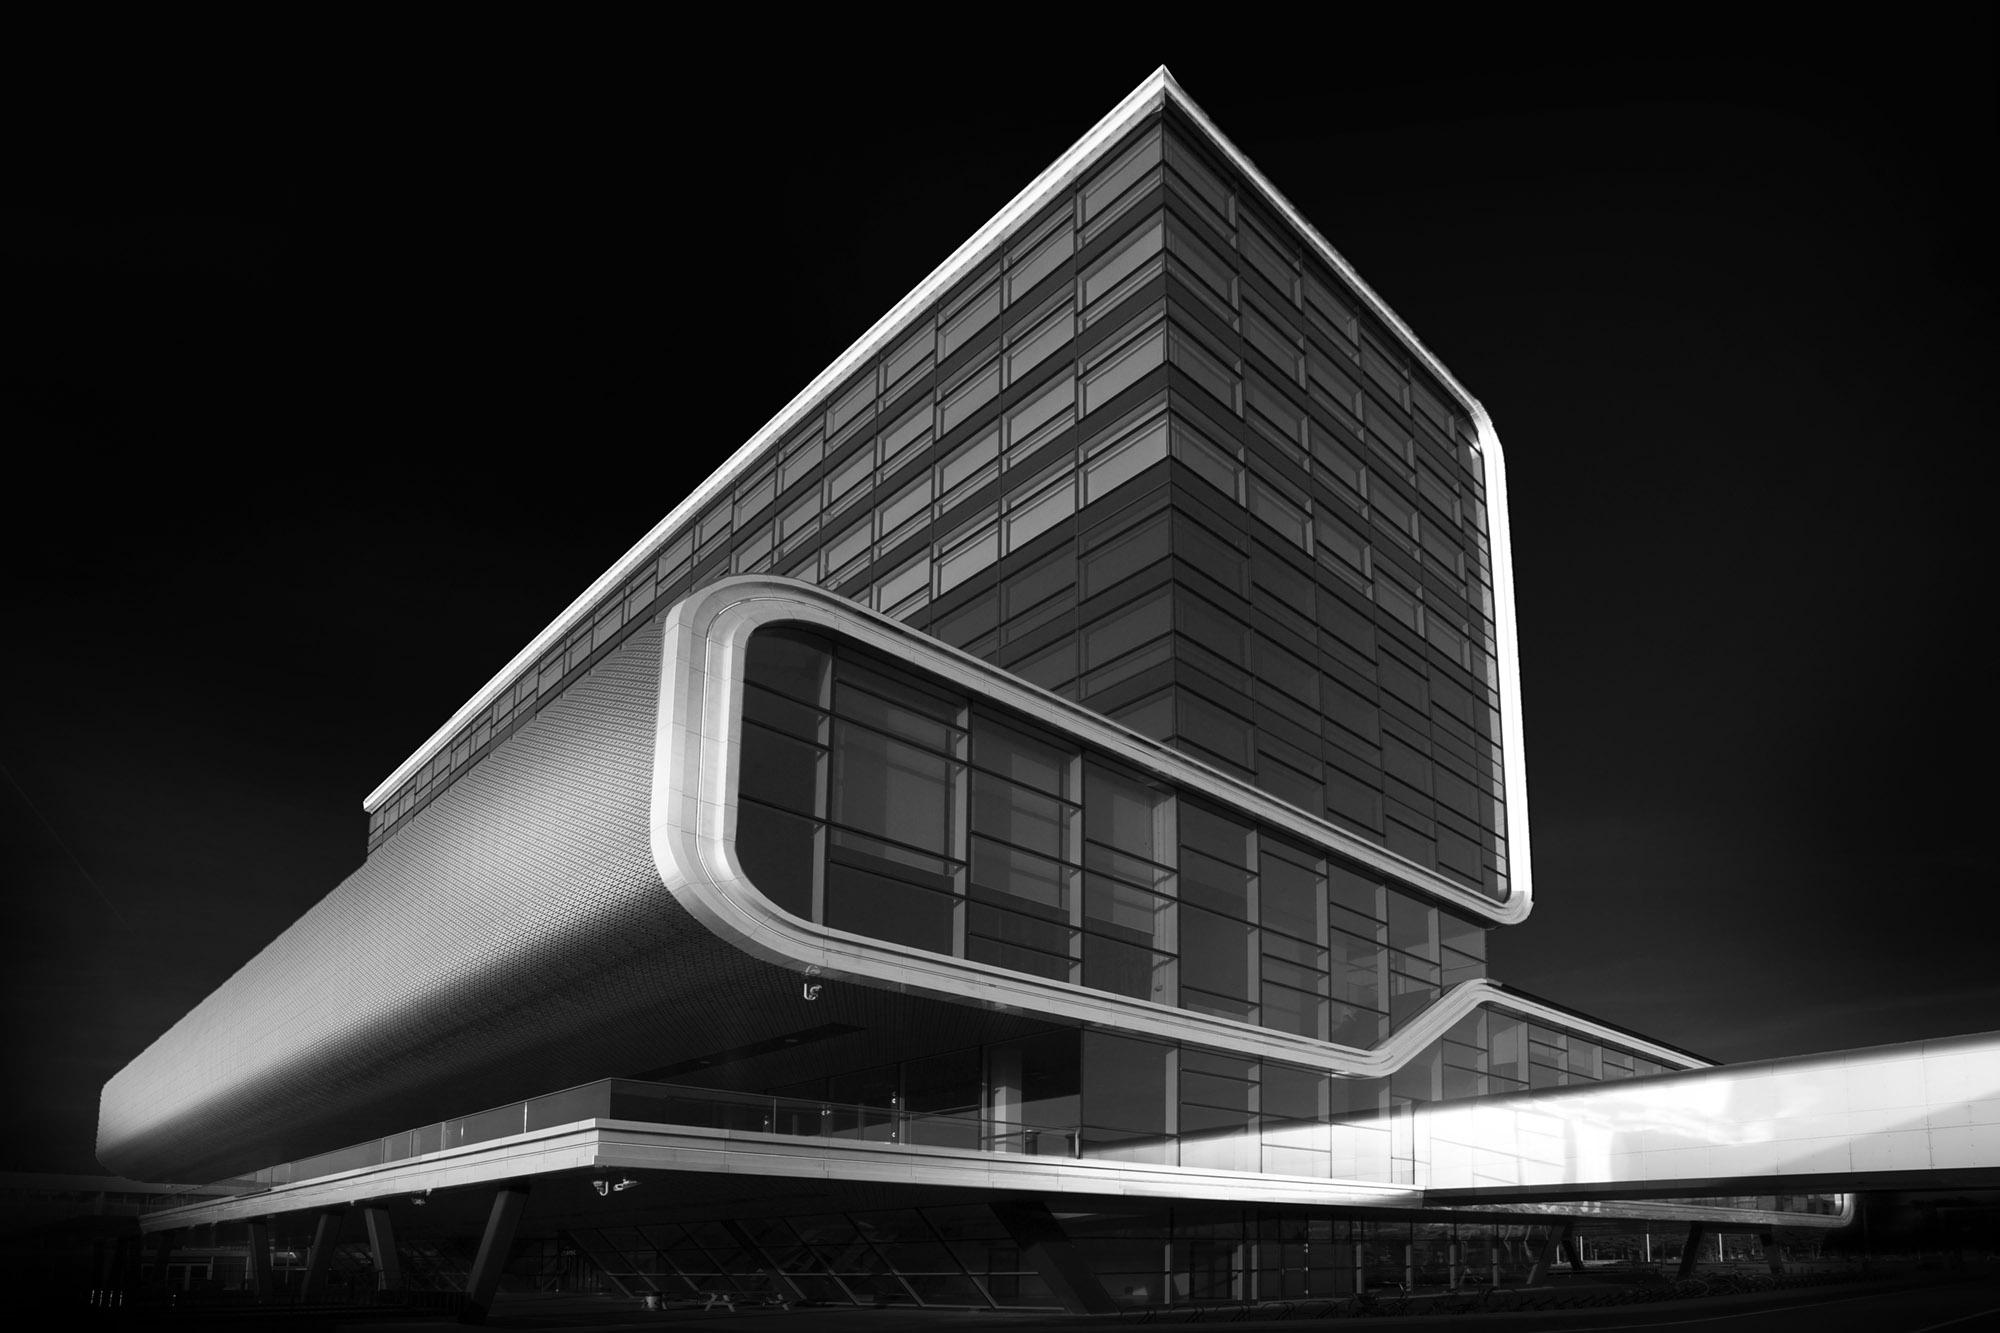 Architecture - Amsterdam, Rai Building Conference Centre (c) Bart Coolen